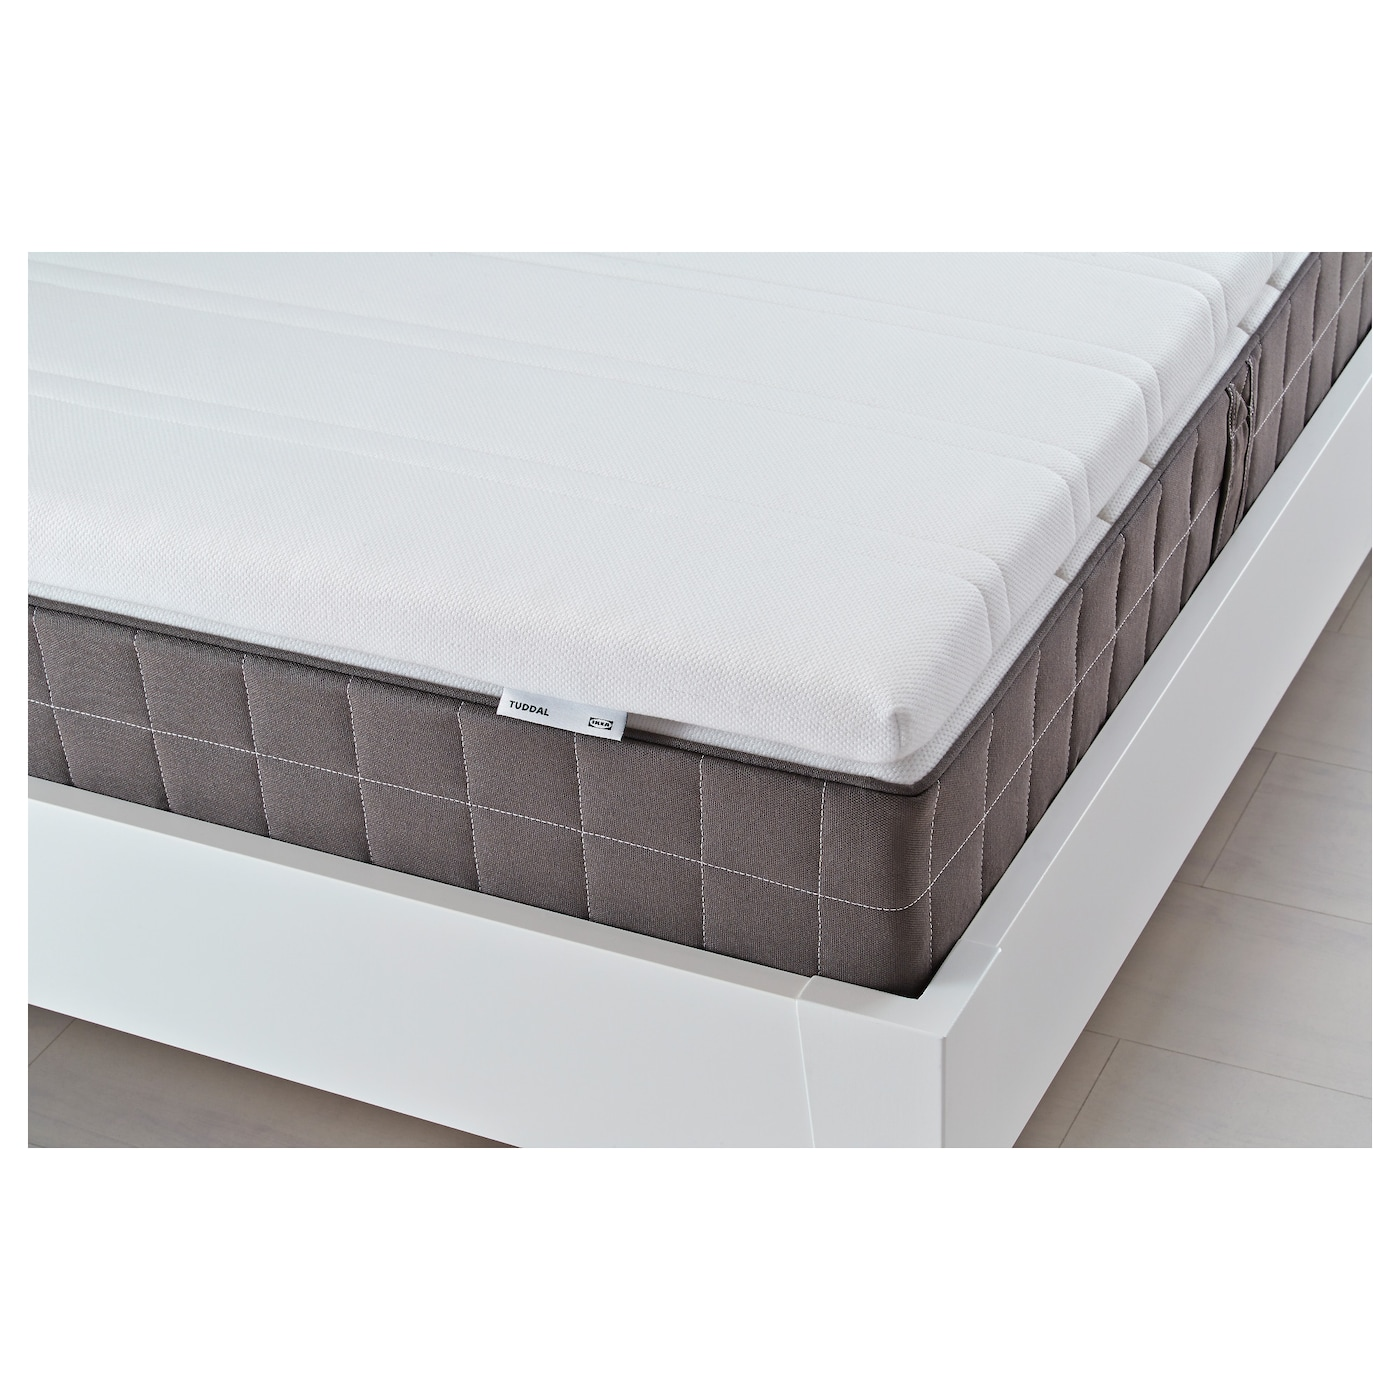 matelas pas cher 90x200 140x200 160x200 180x200 ikea. Black Bedroom Furniture Sets. Home Design Ideas